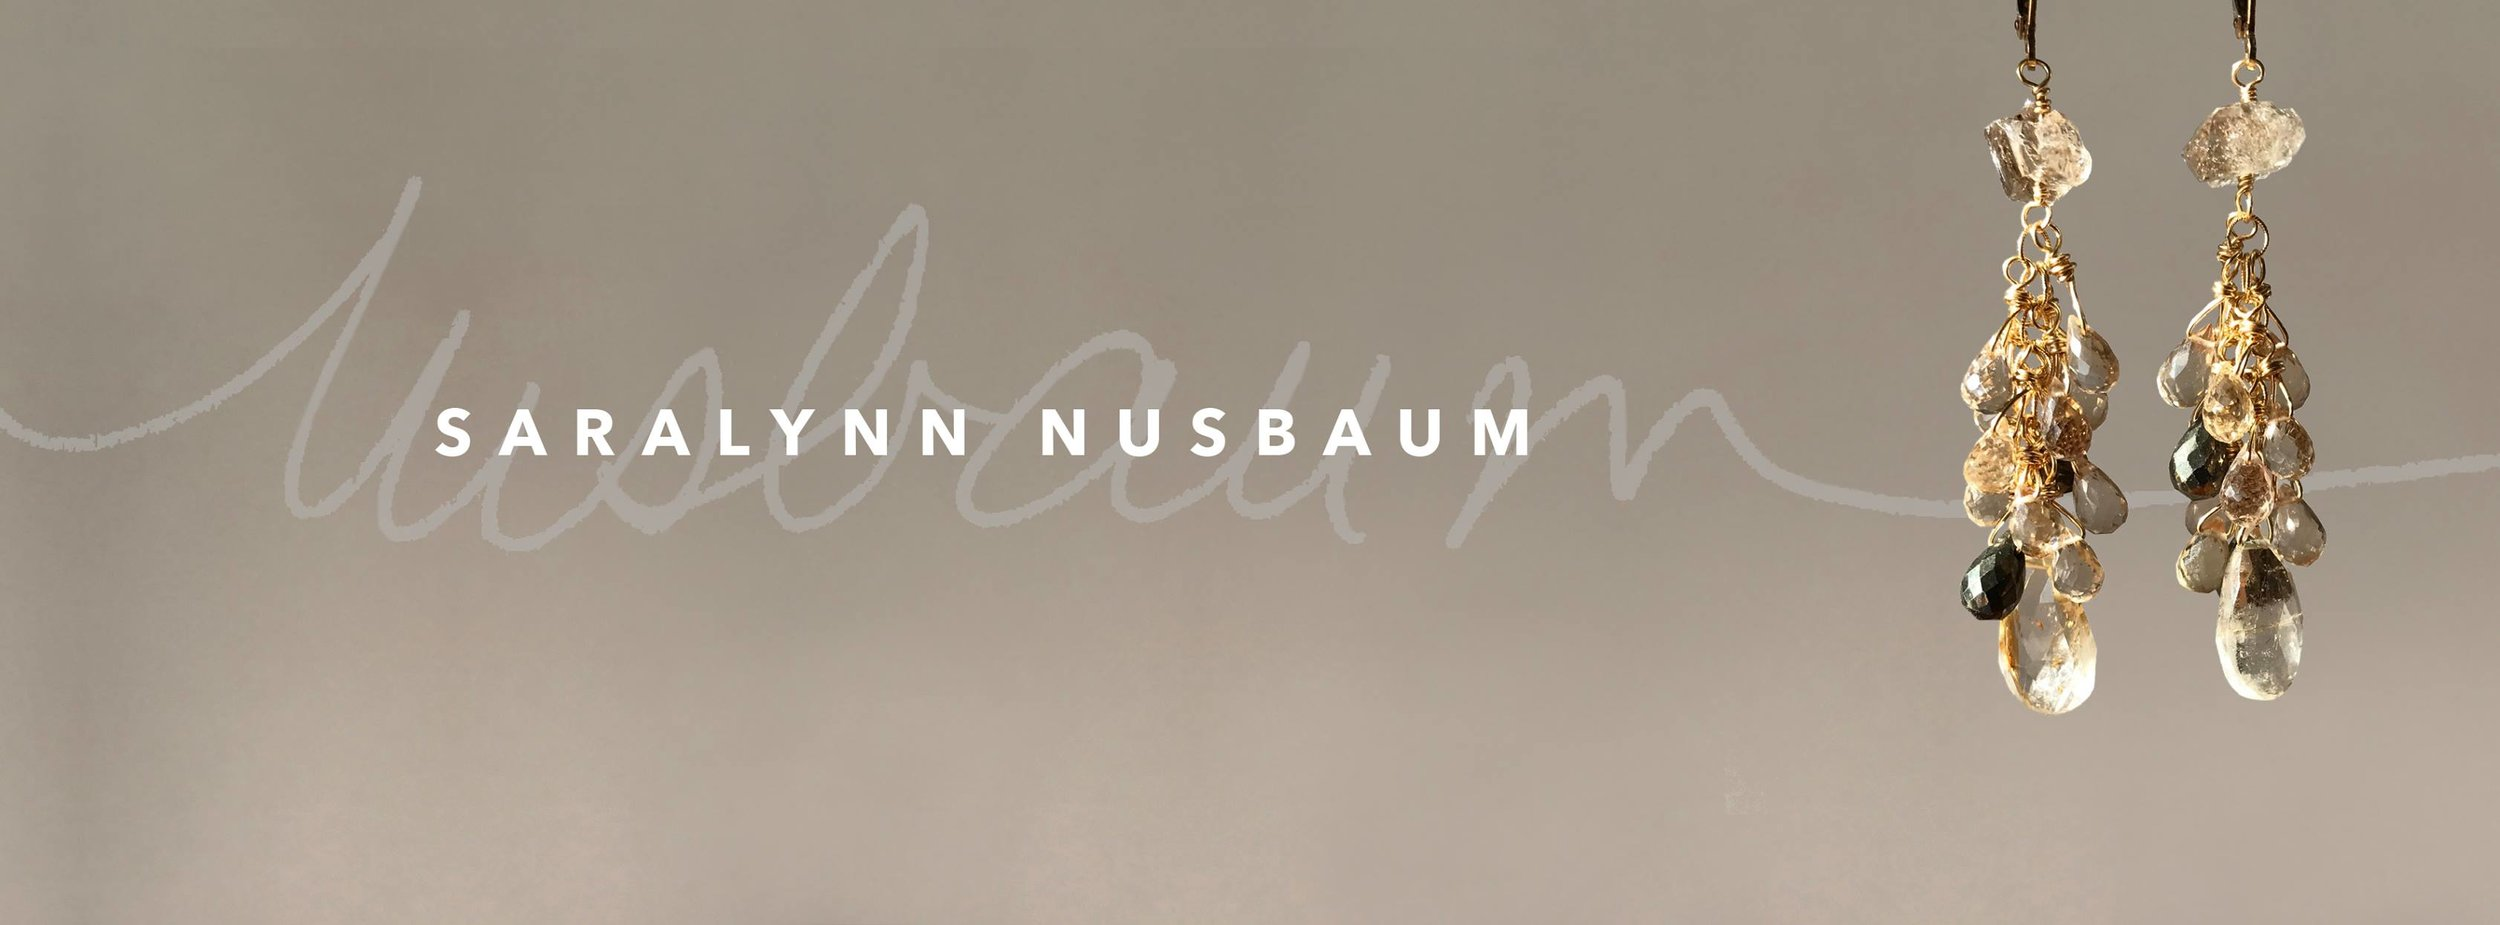 Anna Friedland Saralynn Nusbaum banner.jpg